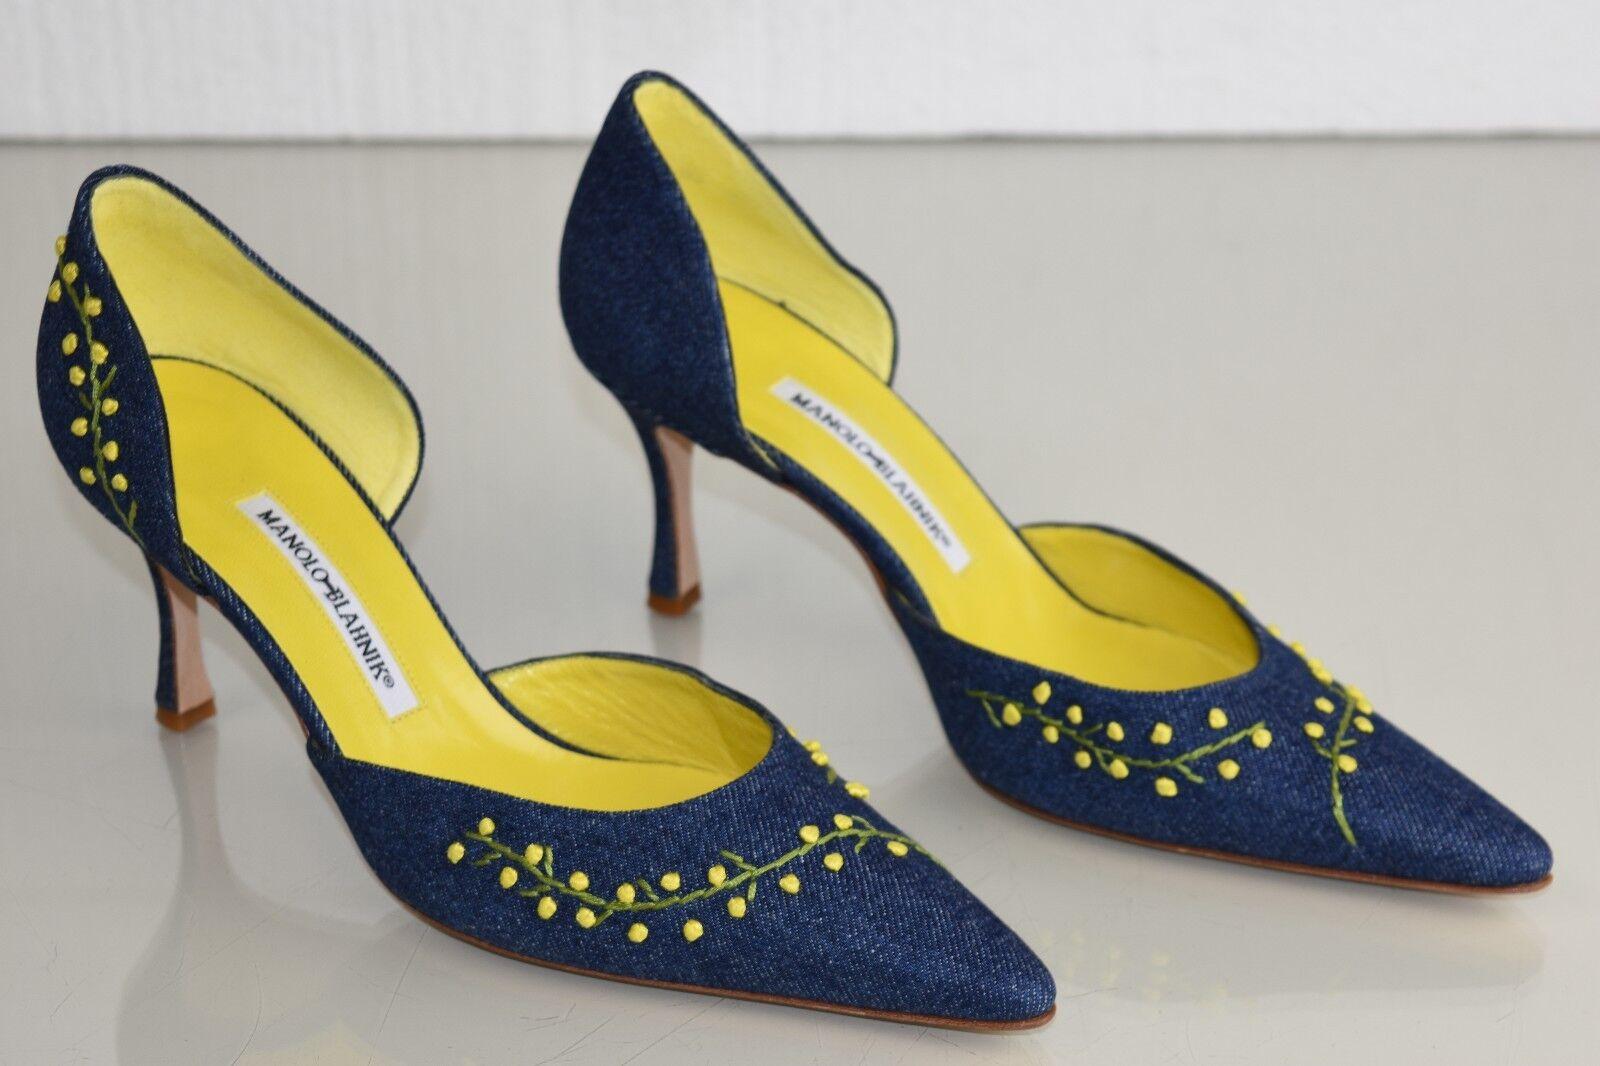 bellissimo Nuovo Manolo Blahnik Bb Mimo Blu Denim Giallo Mimosa Mimosa Mimosa Dorsay scarpe 37 Rare  punto vendita